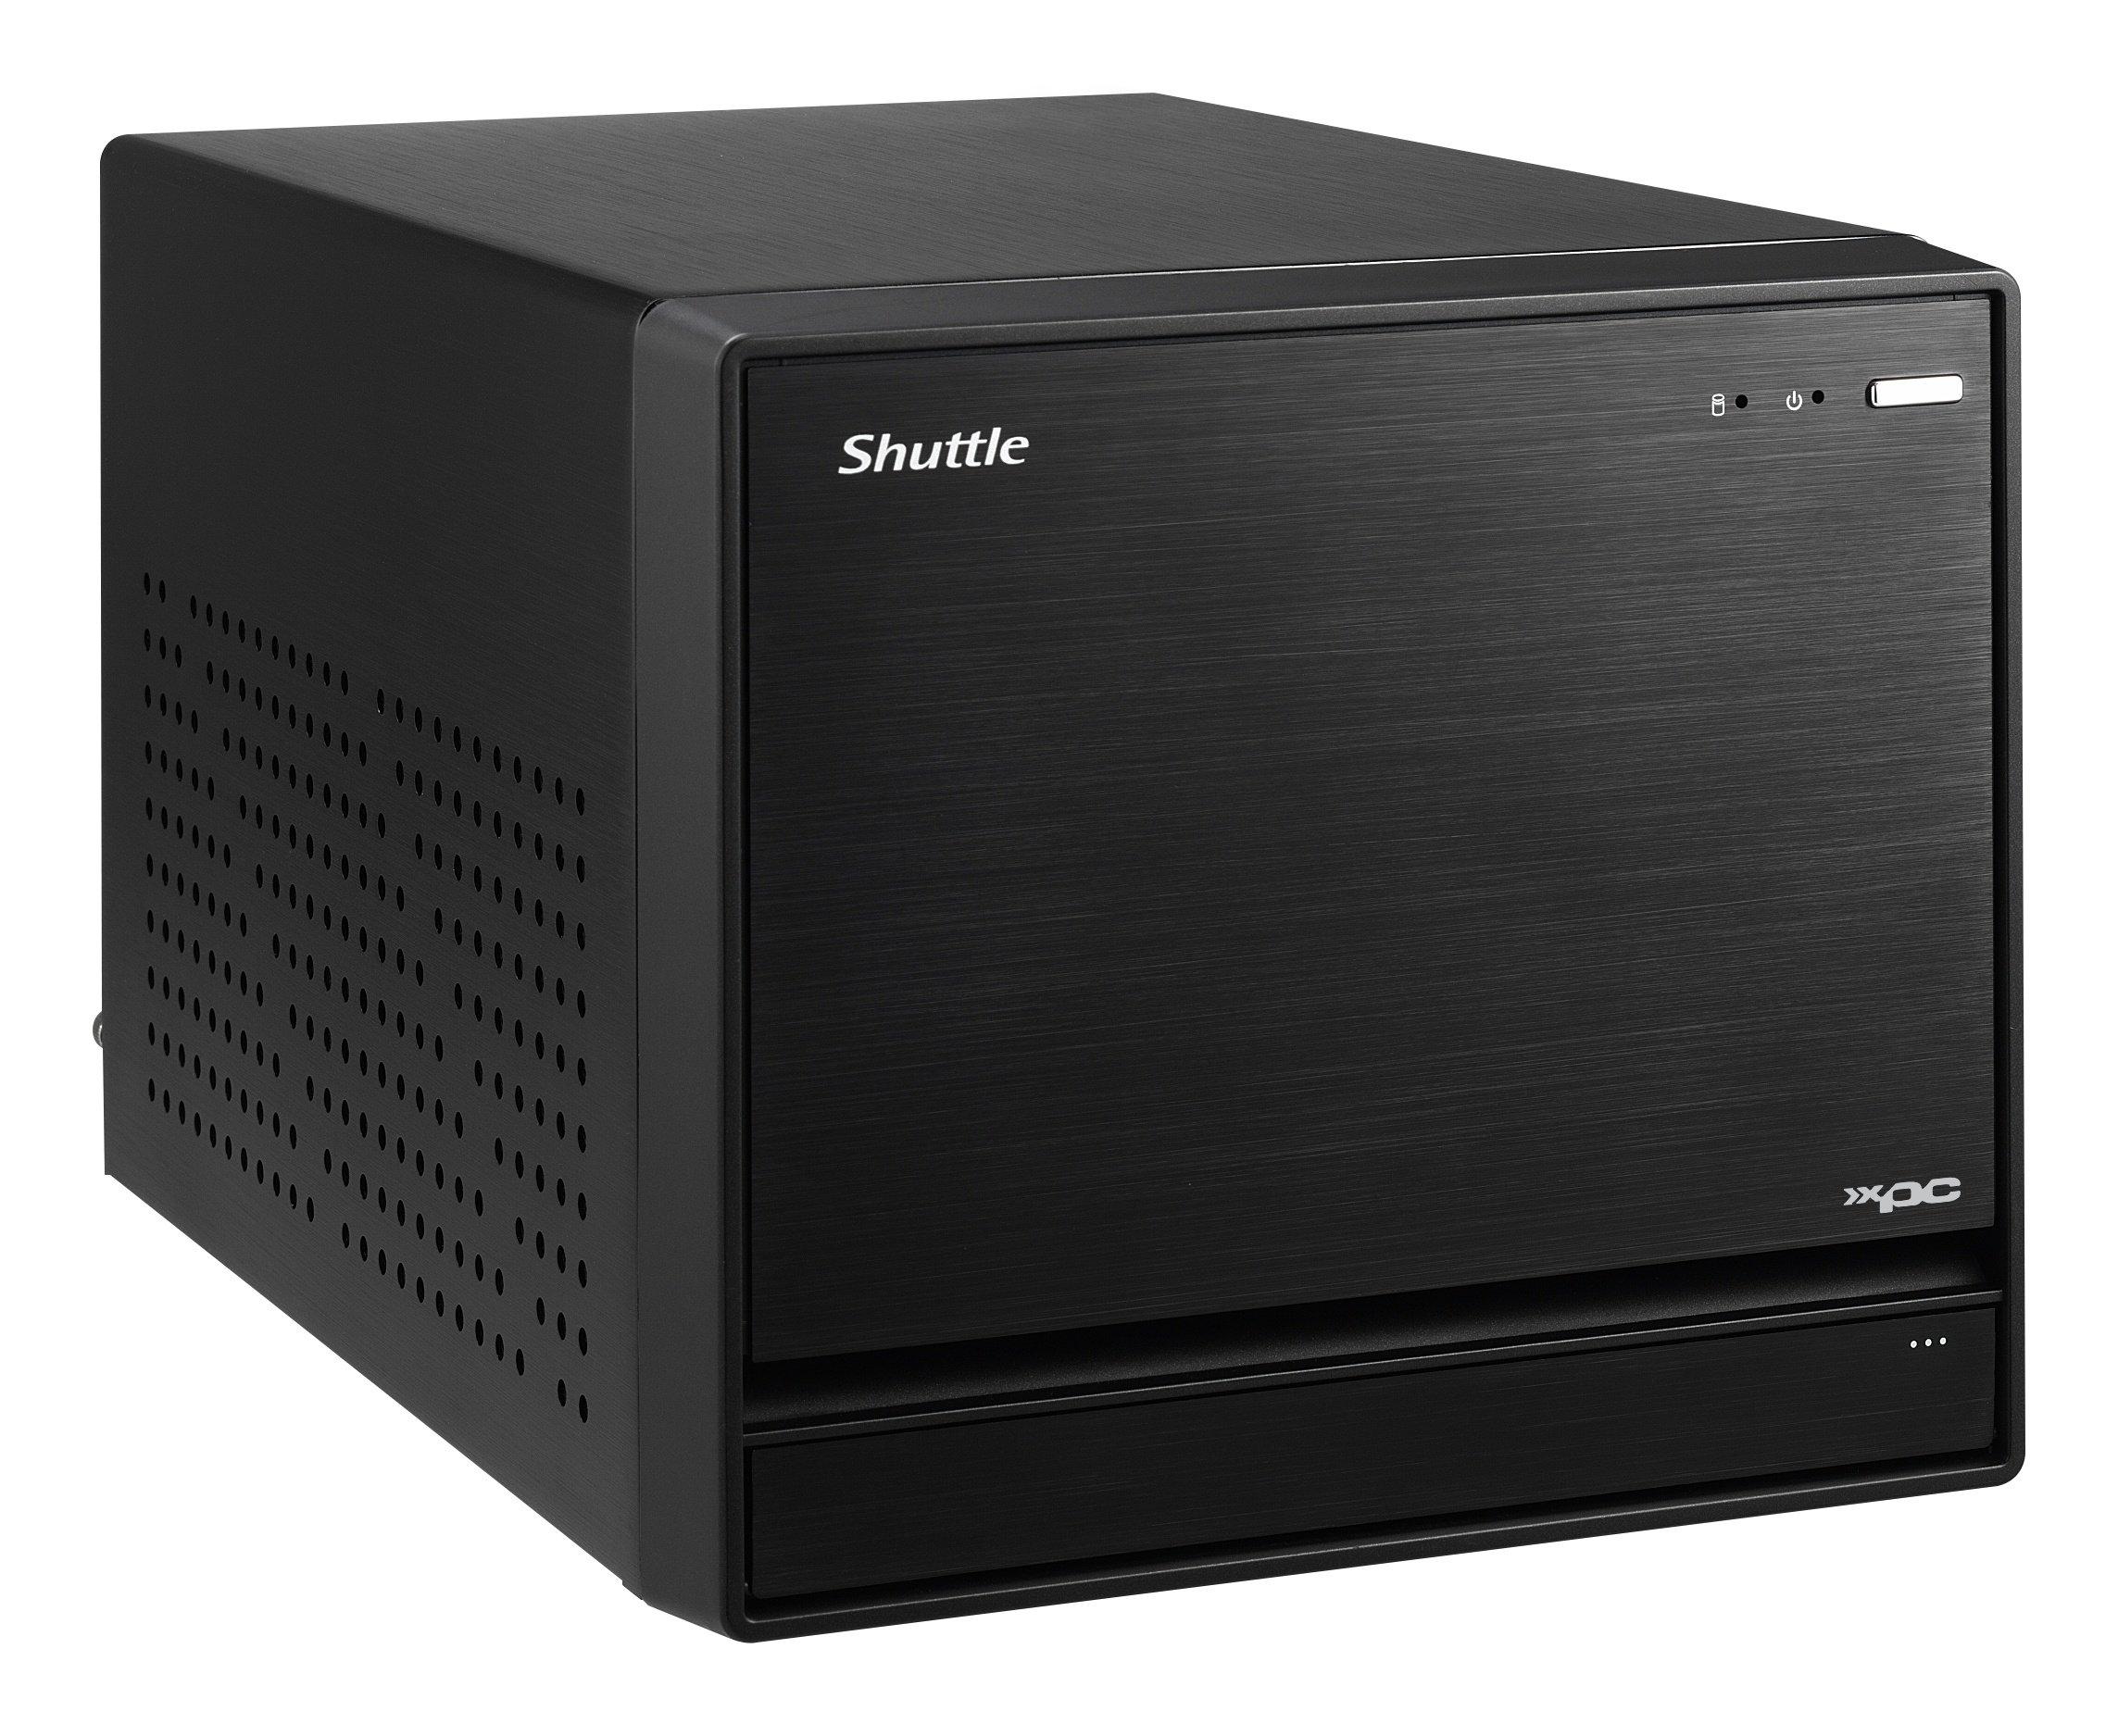 Shuttle XPC Cube SZ170R8V2, SFF Intel Skylake Z170 Chipset LGA1151 i3/i5/i7/Pentium, DDR4 (MAX. 64GB), ICE 2 Cooling Heatpipe by Shuttle